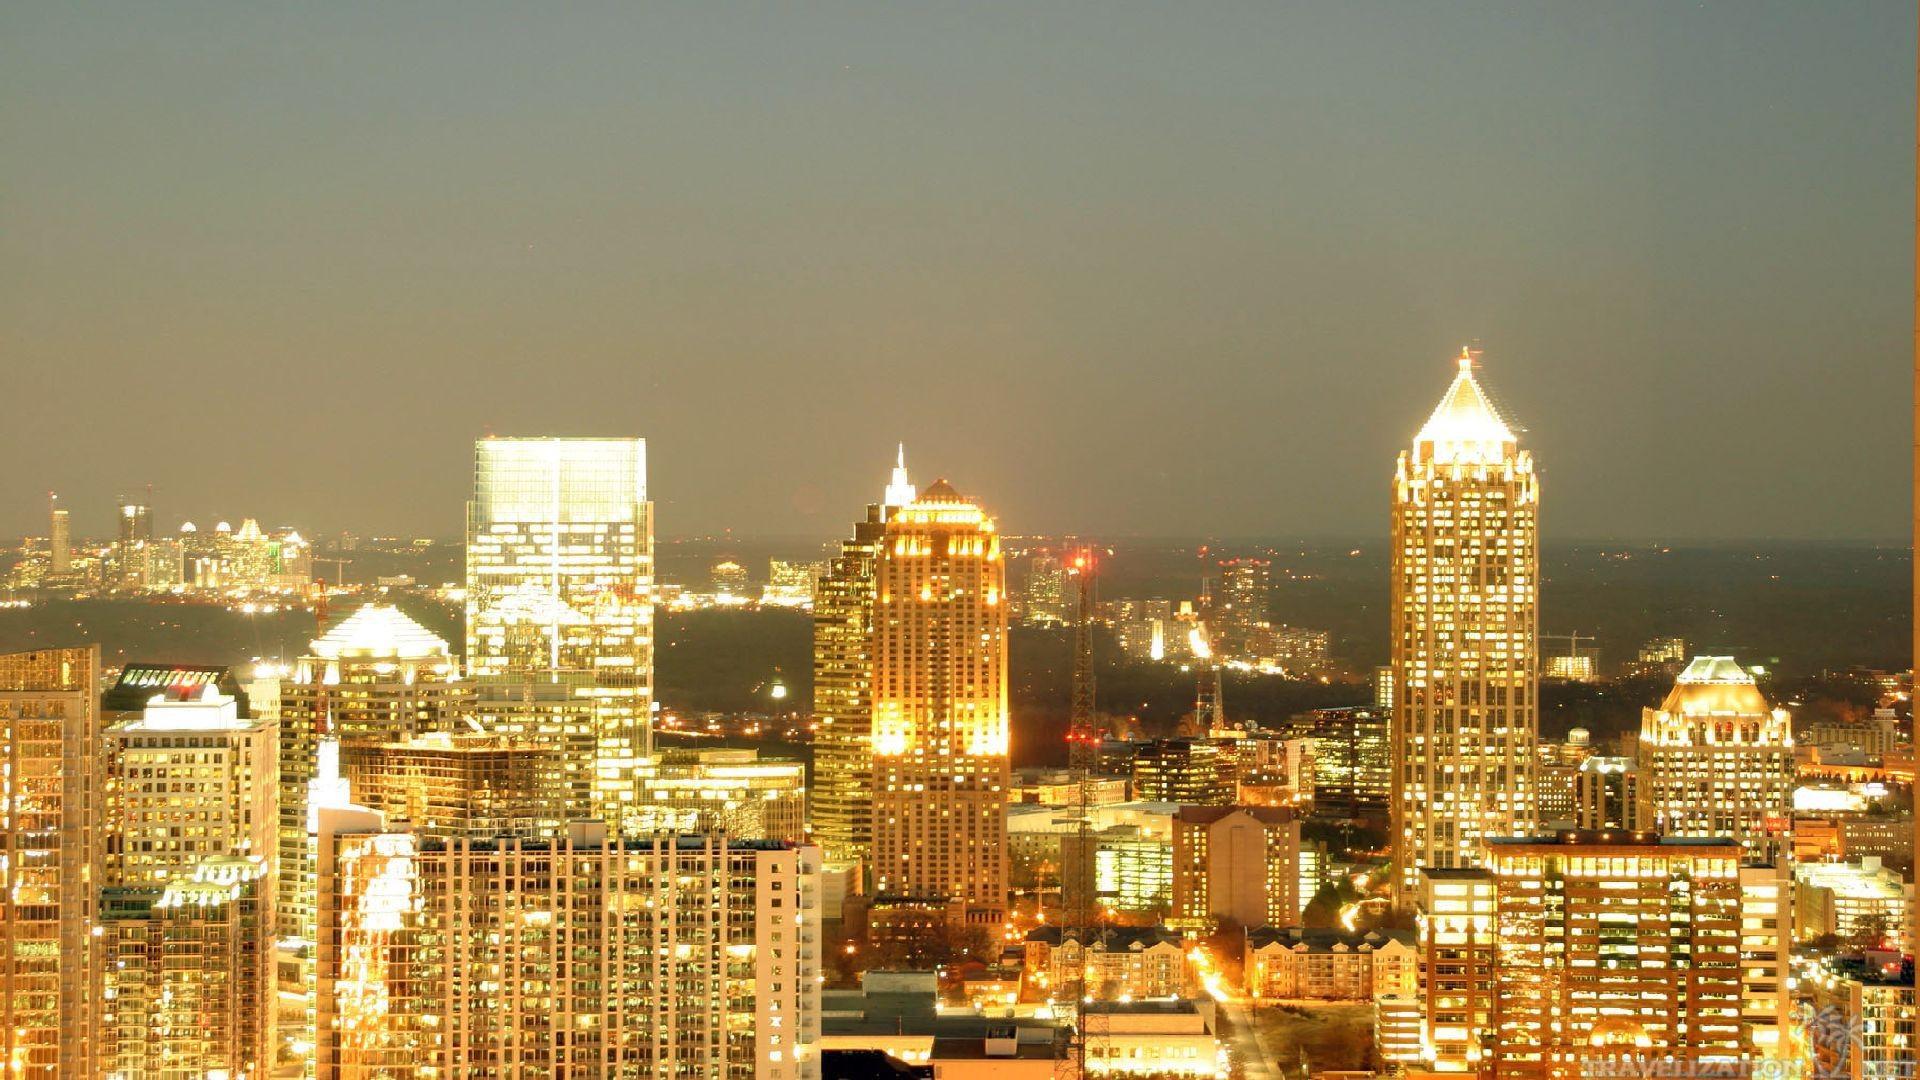 Atlanta free image